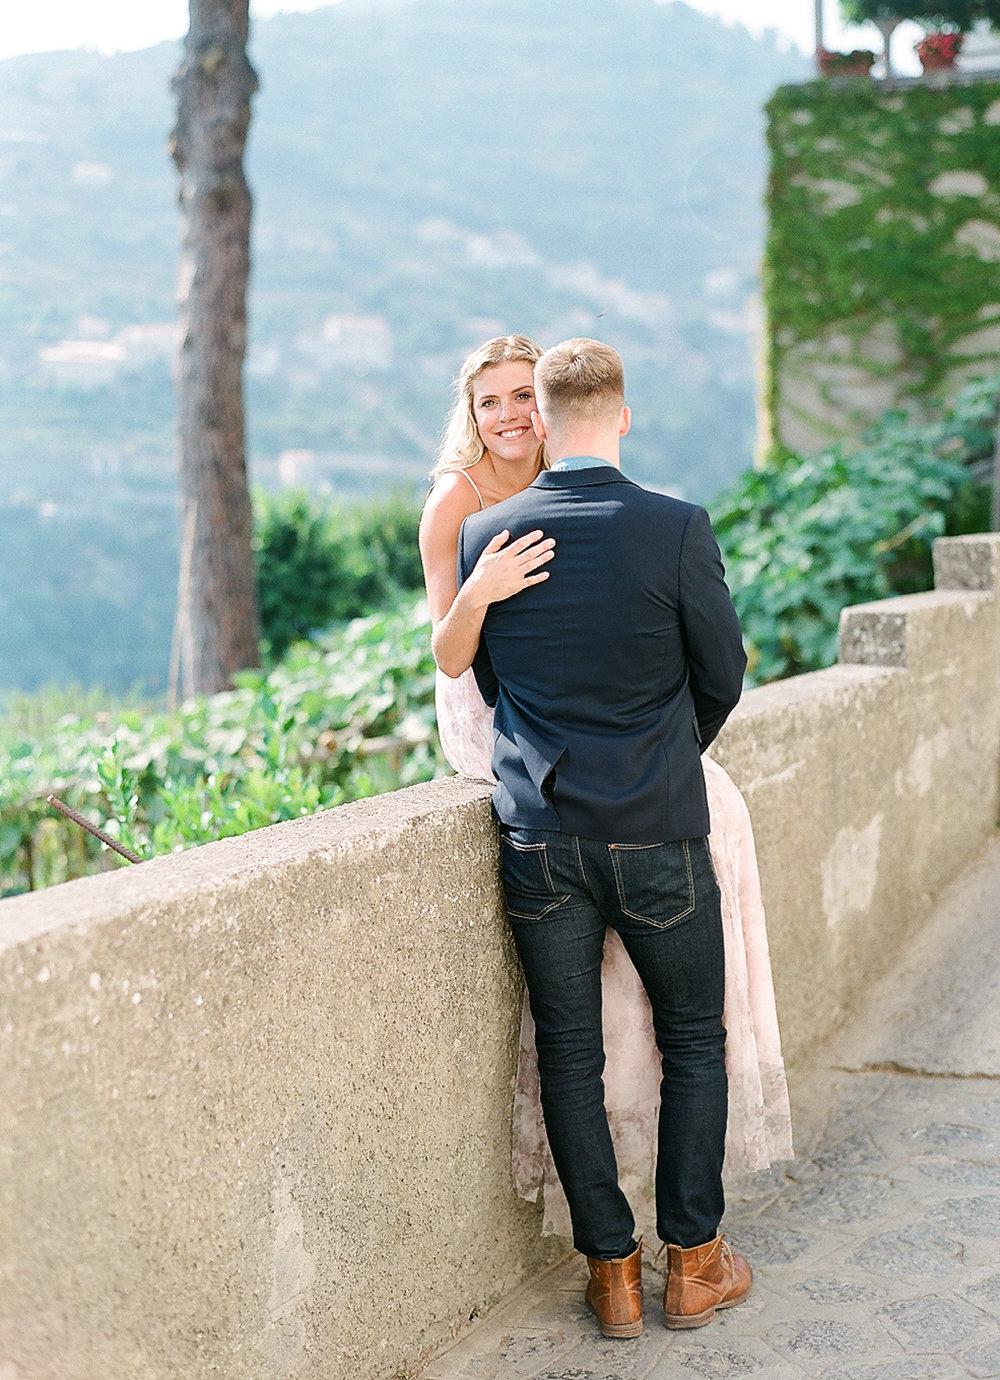 Bonphotage Ravello Italy Fine Art Wedding Photography - Villa Cimbrone